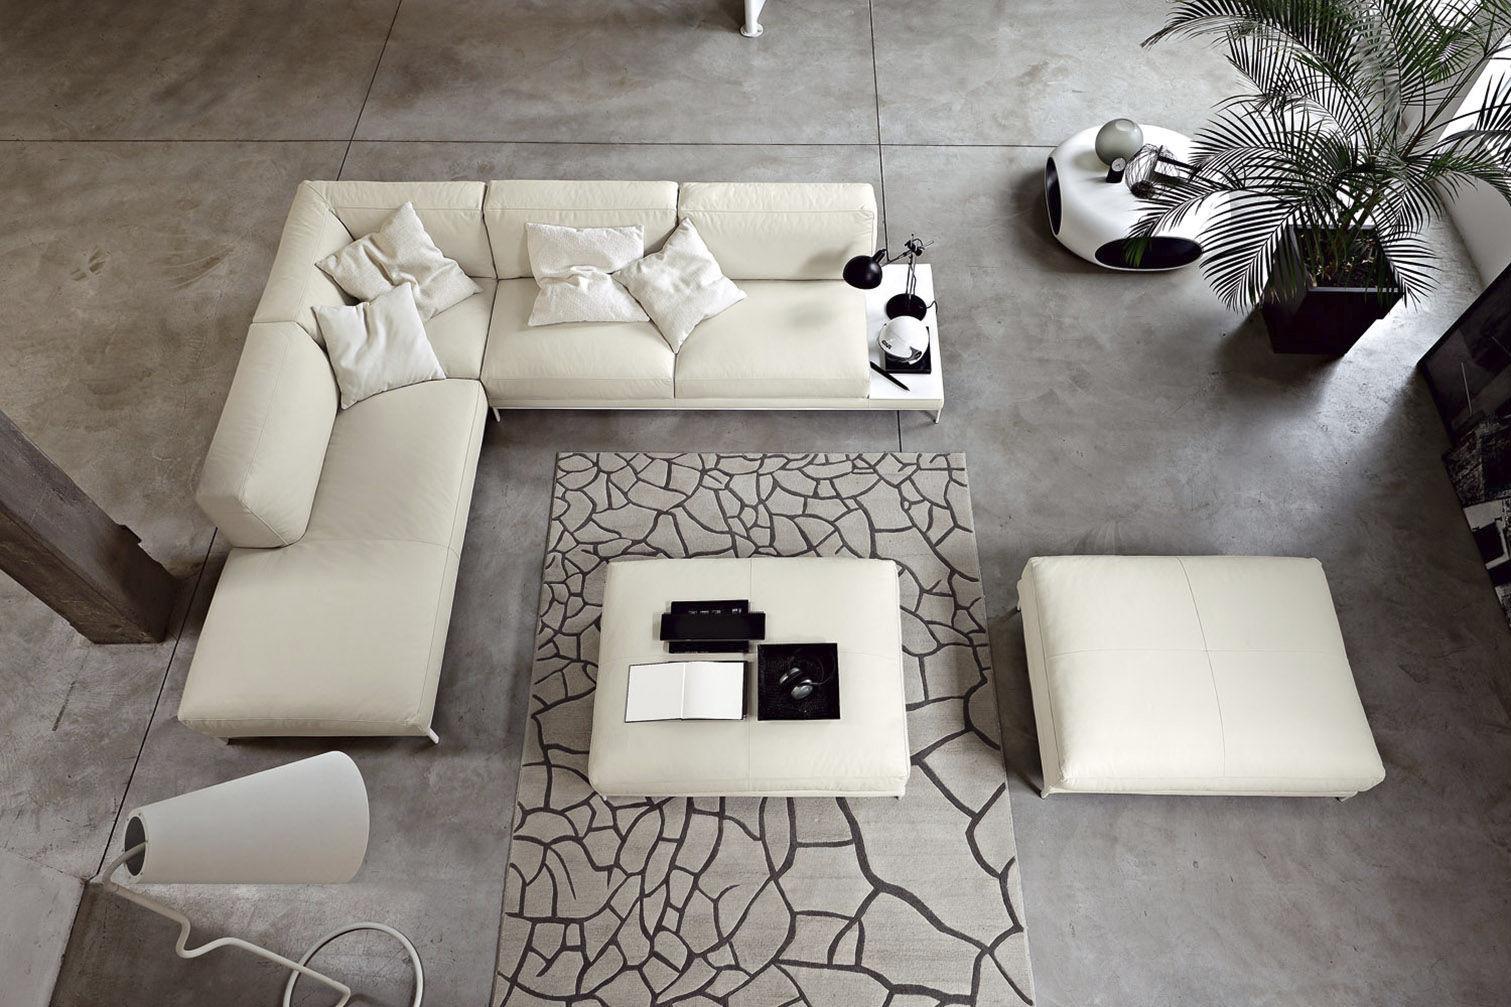 Divano d\'angolo / modulare / moderno / in pelle - SHADE by Spessotto ...